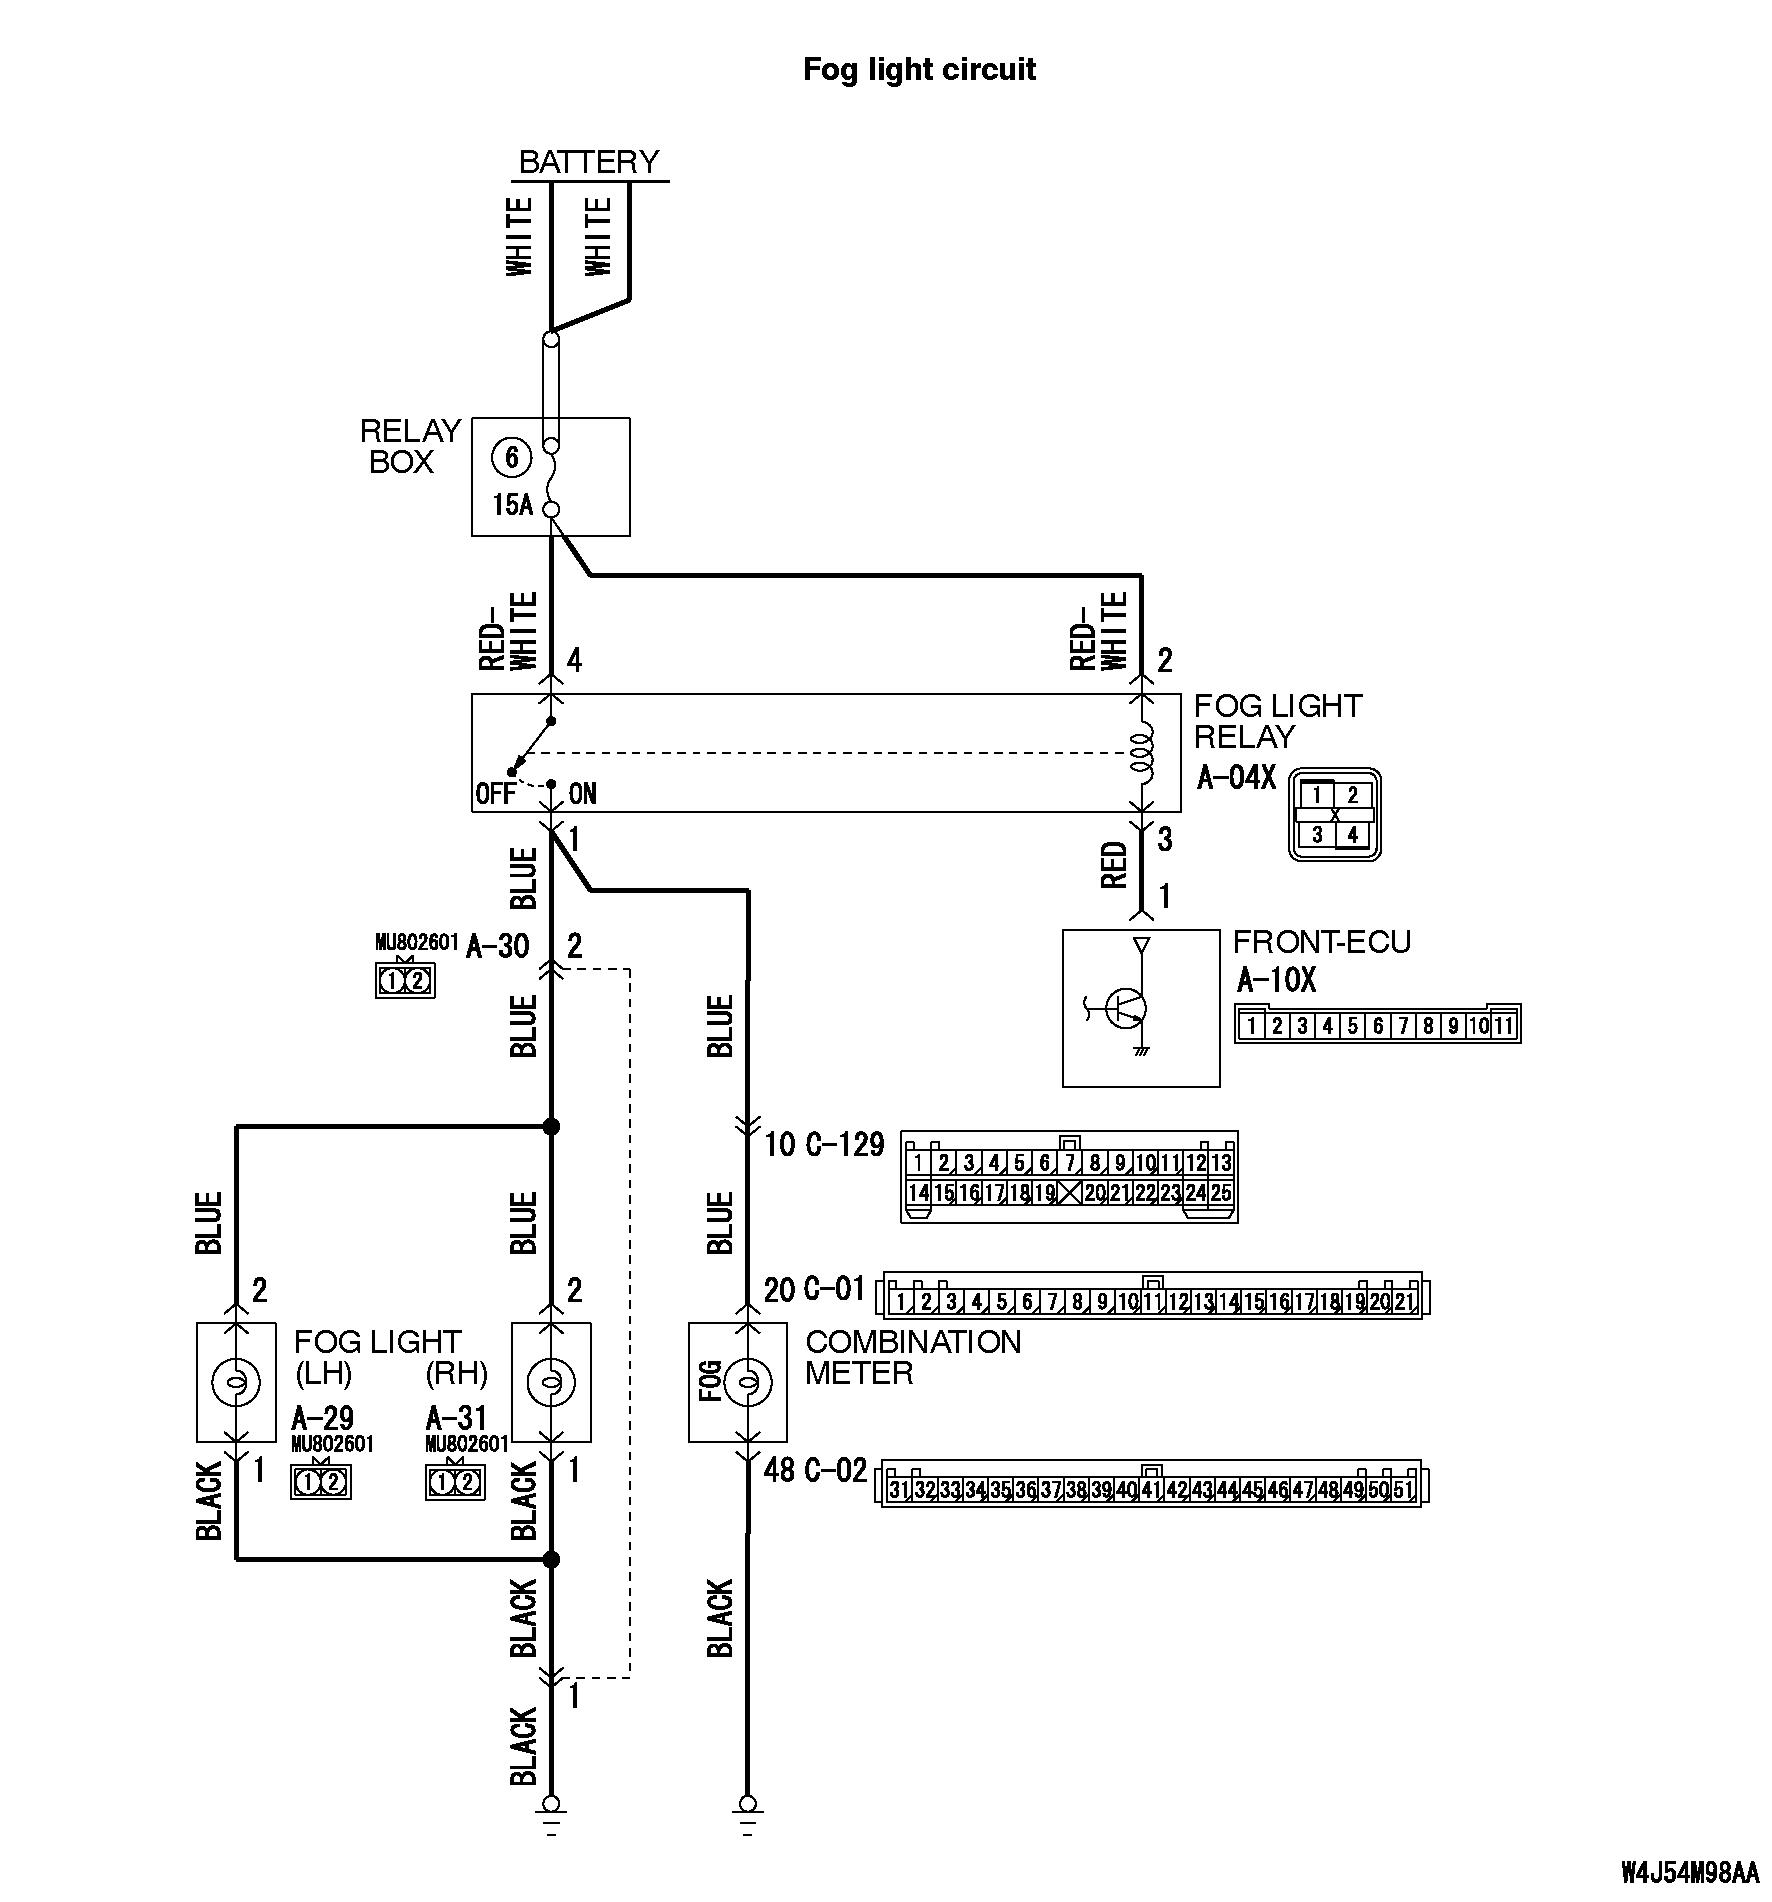 Wiring Diagram For 02 Toyota Tundra 2007 Fog Light